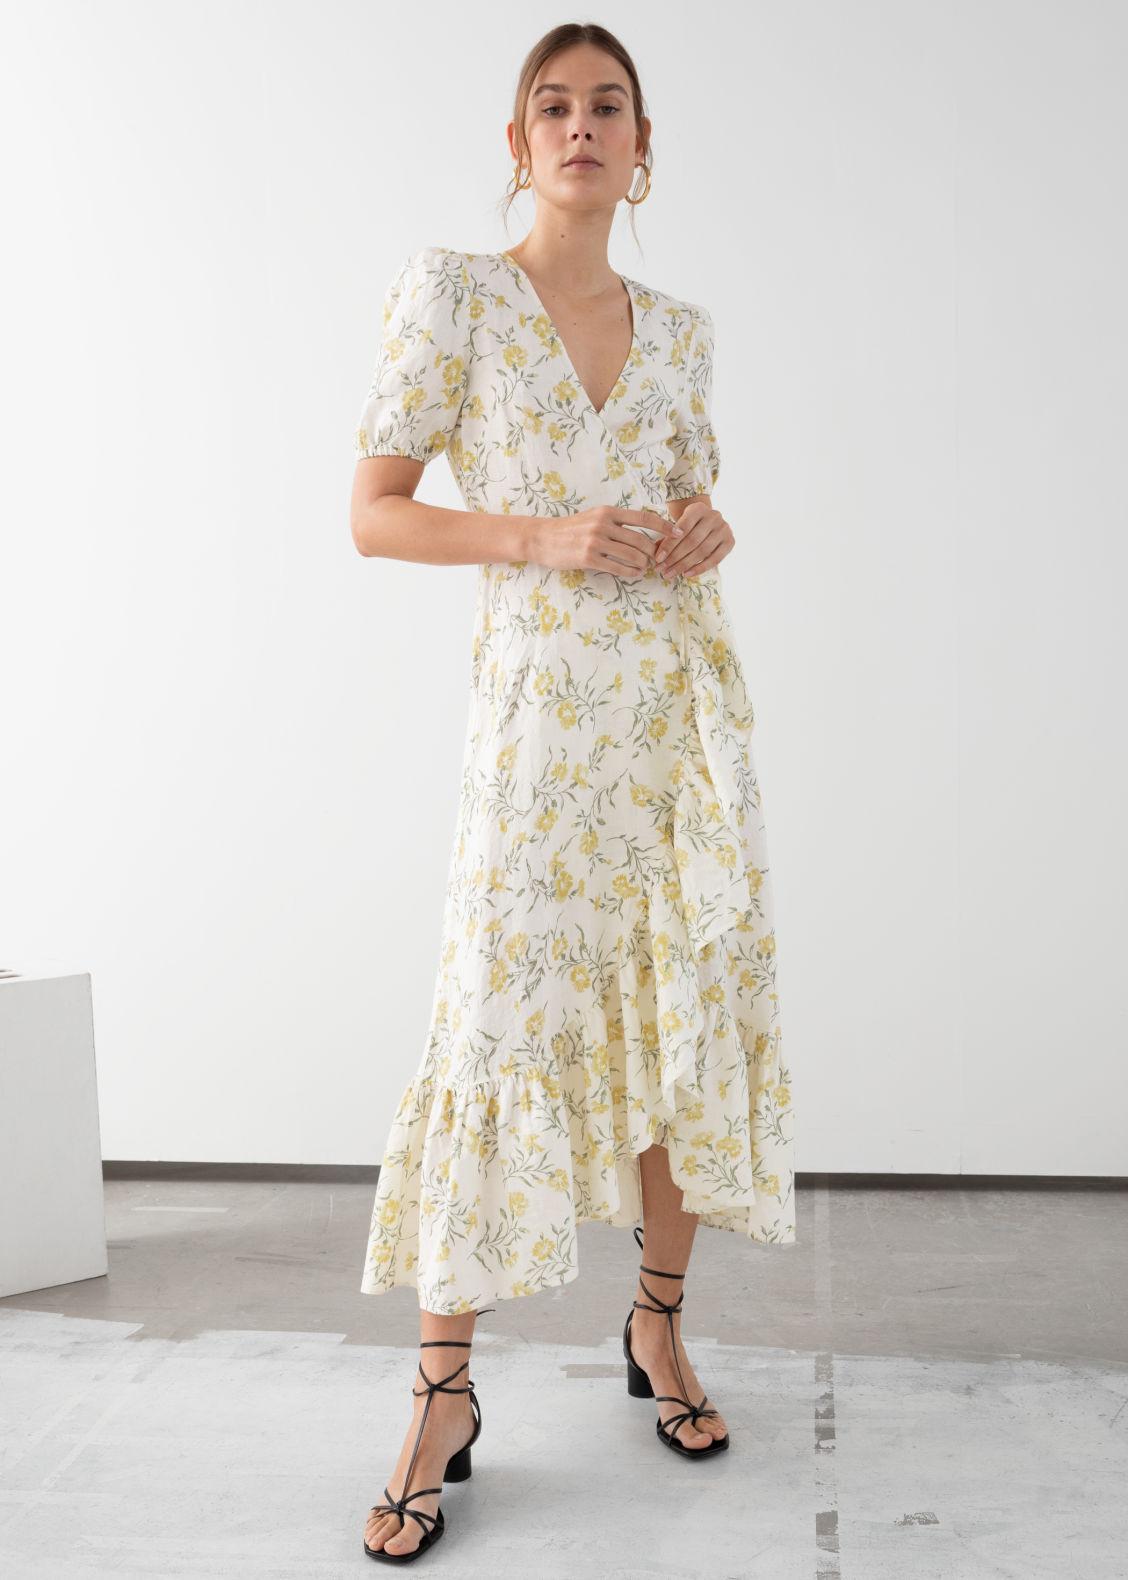 8eed3d8b7557a Ruffled Linen Wrap Midi Dress - Floral Print - Midi dresses -   Other ...